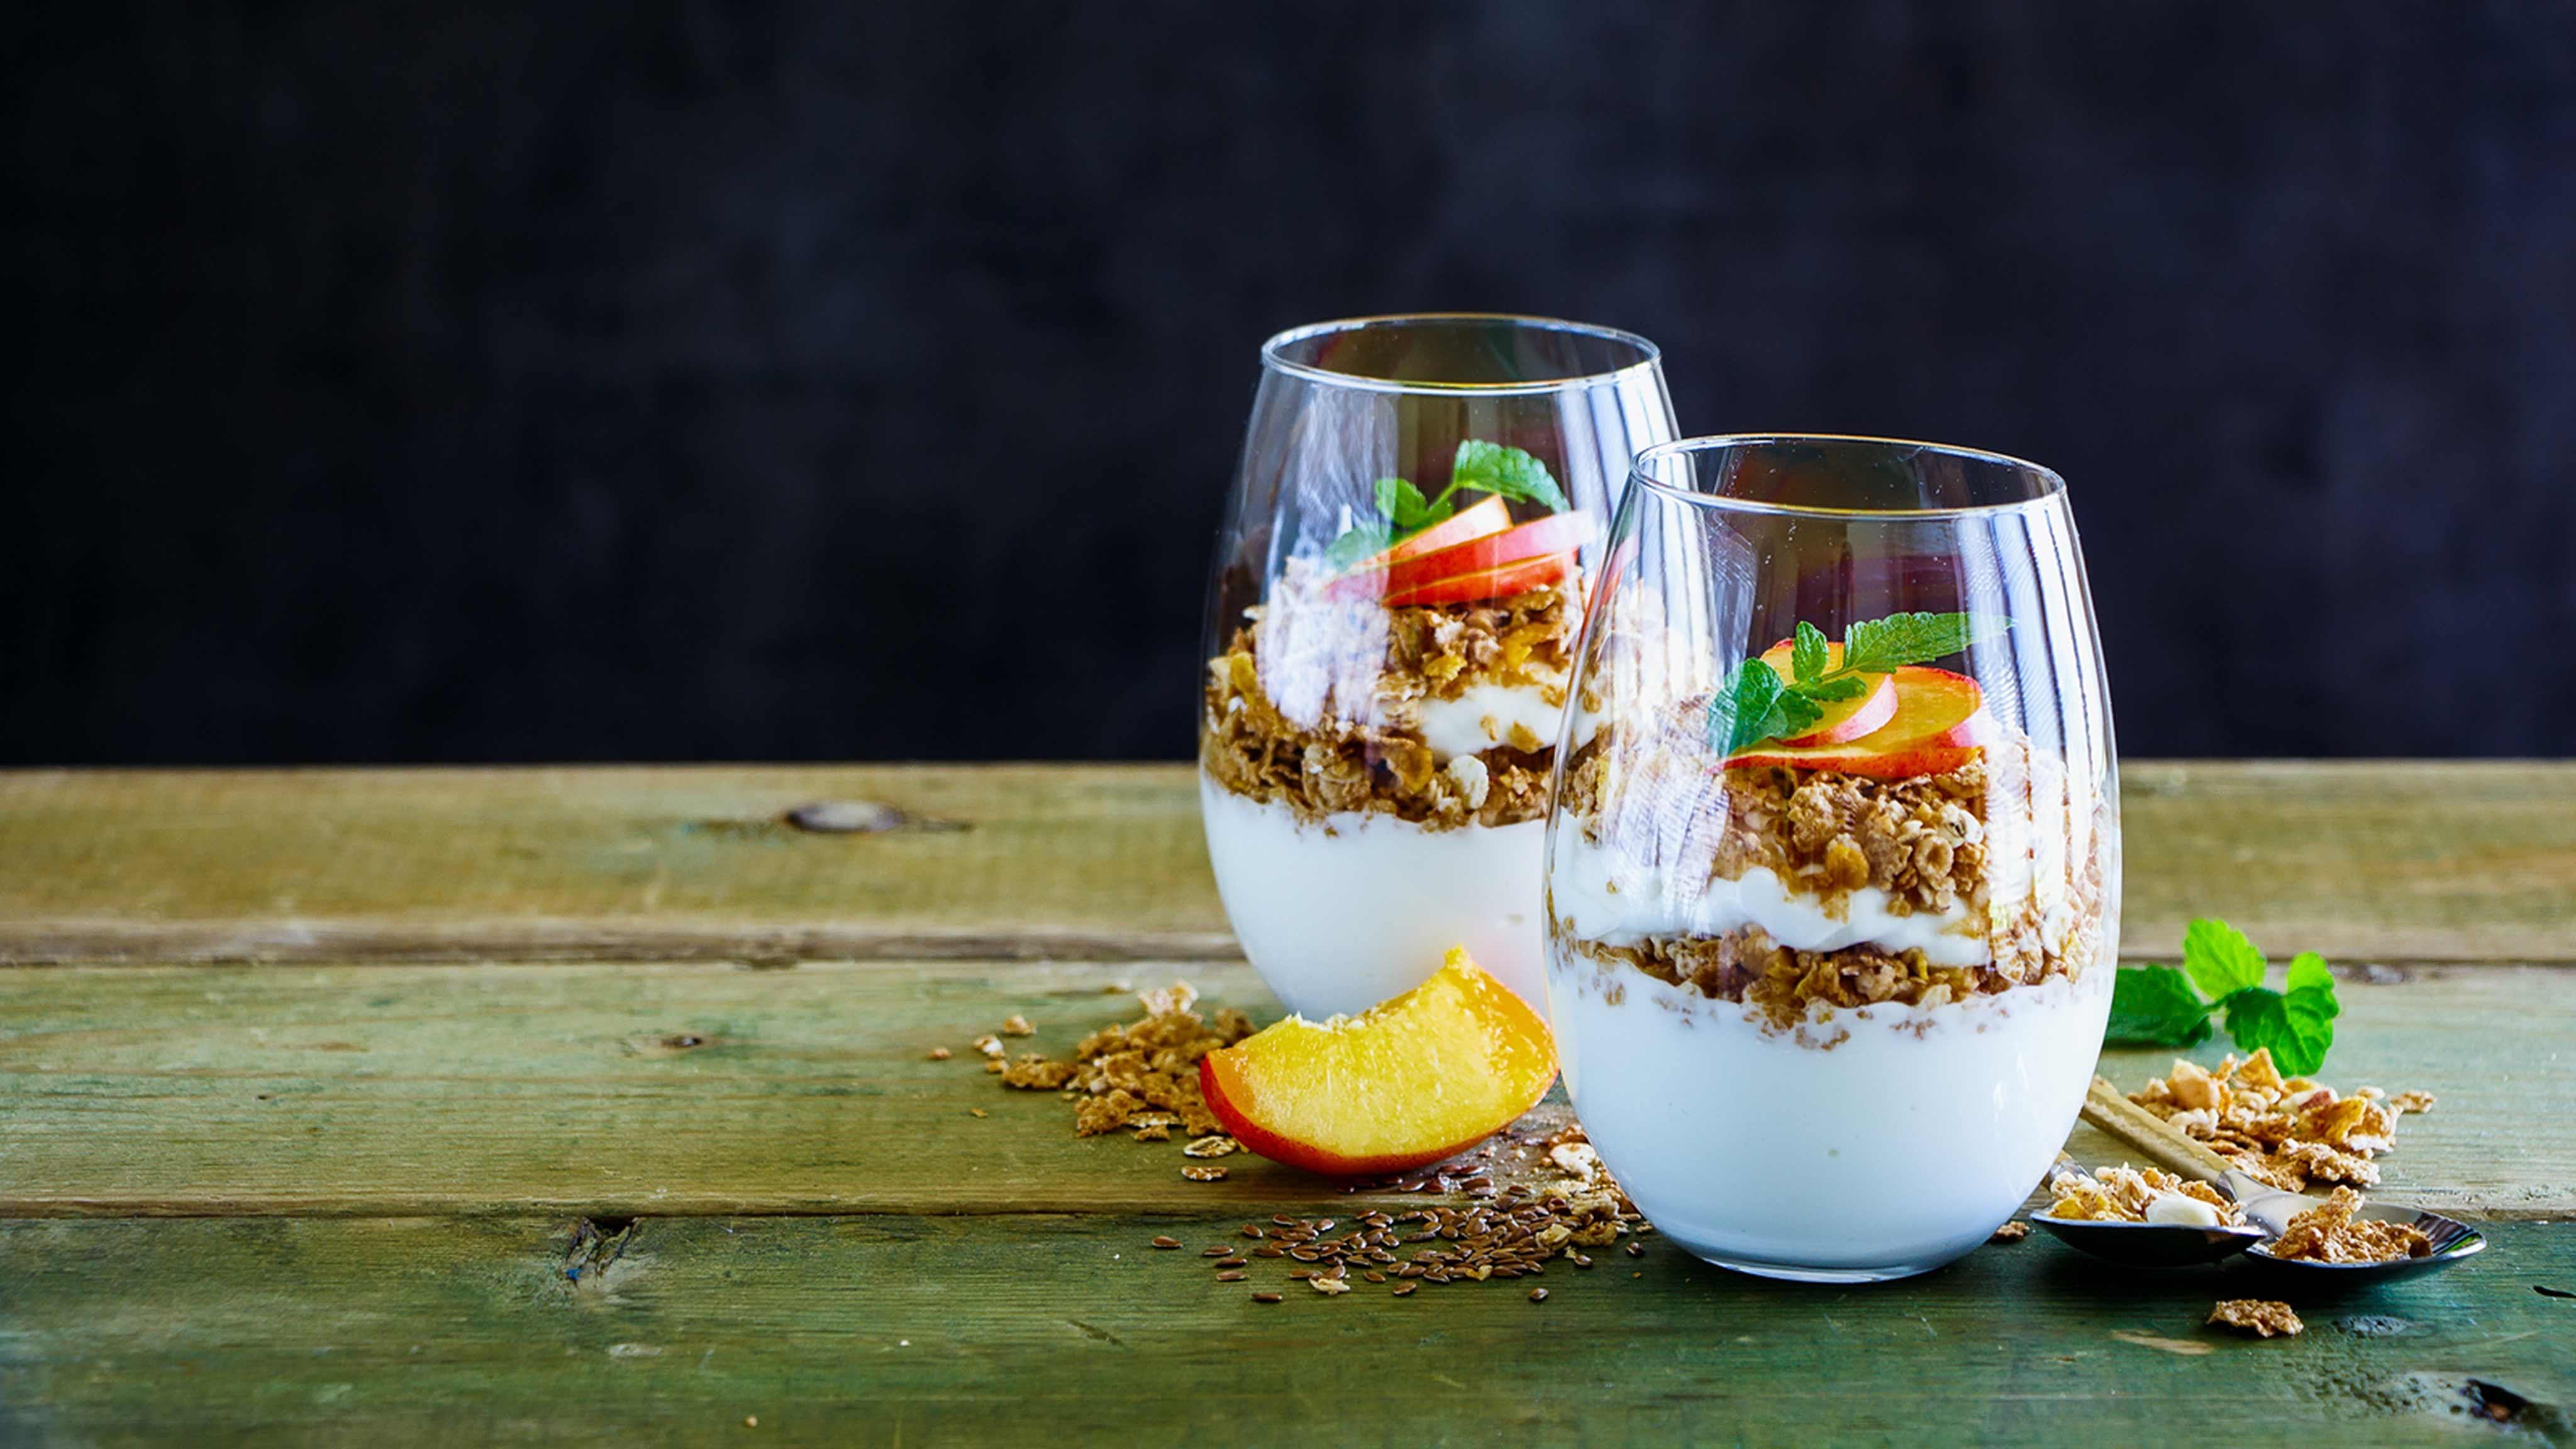 Image for Recipe Peachy Granola Yogurt Parfait